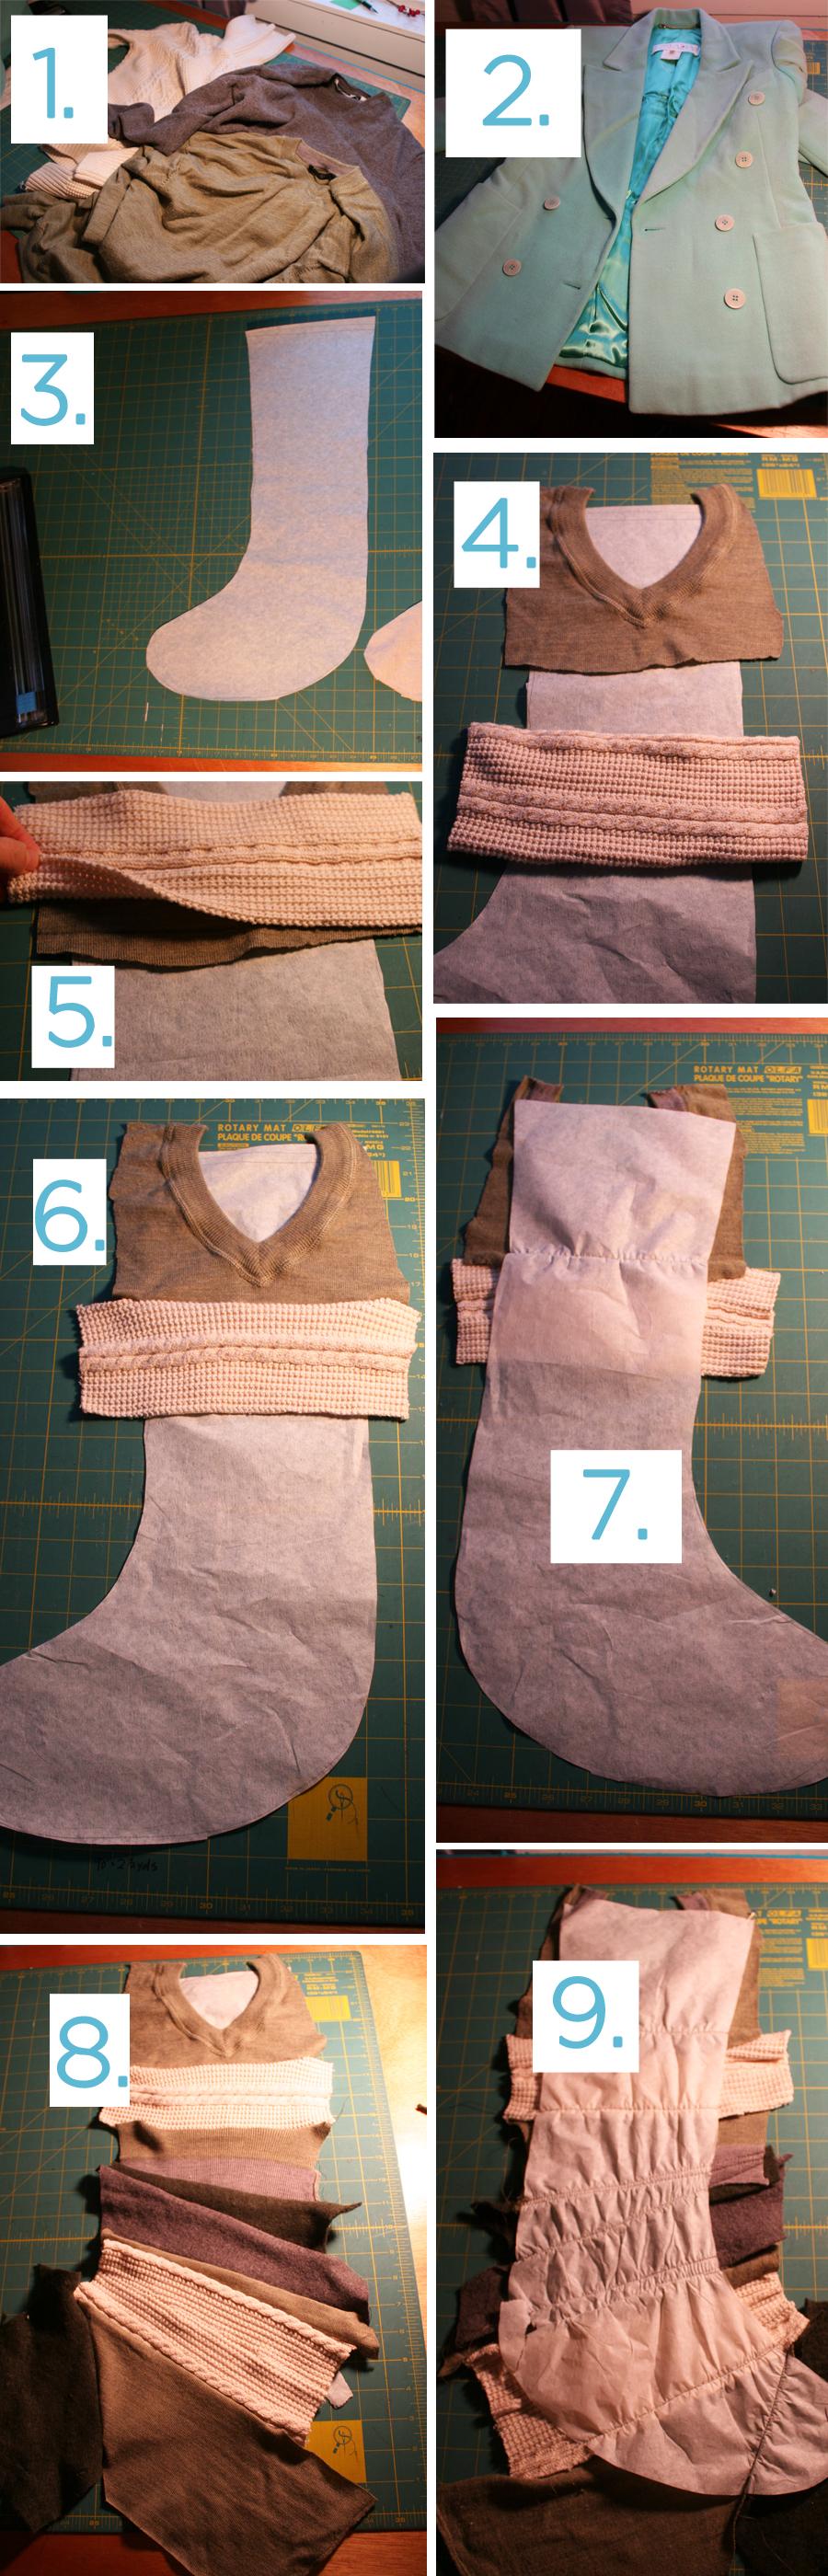 stitch_and_flip_stockingsnew